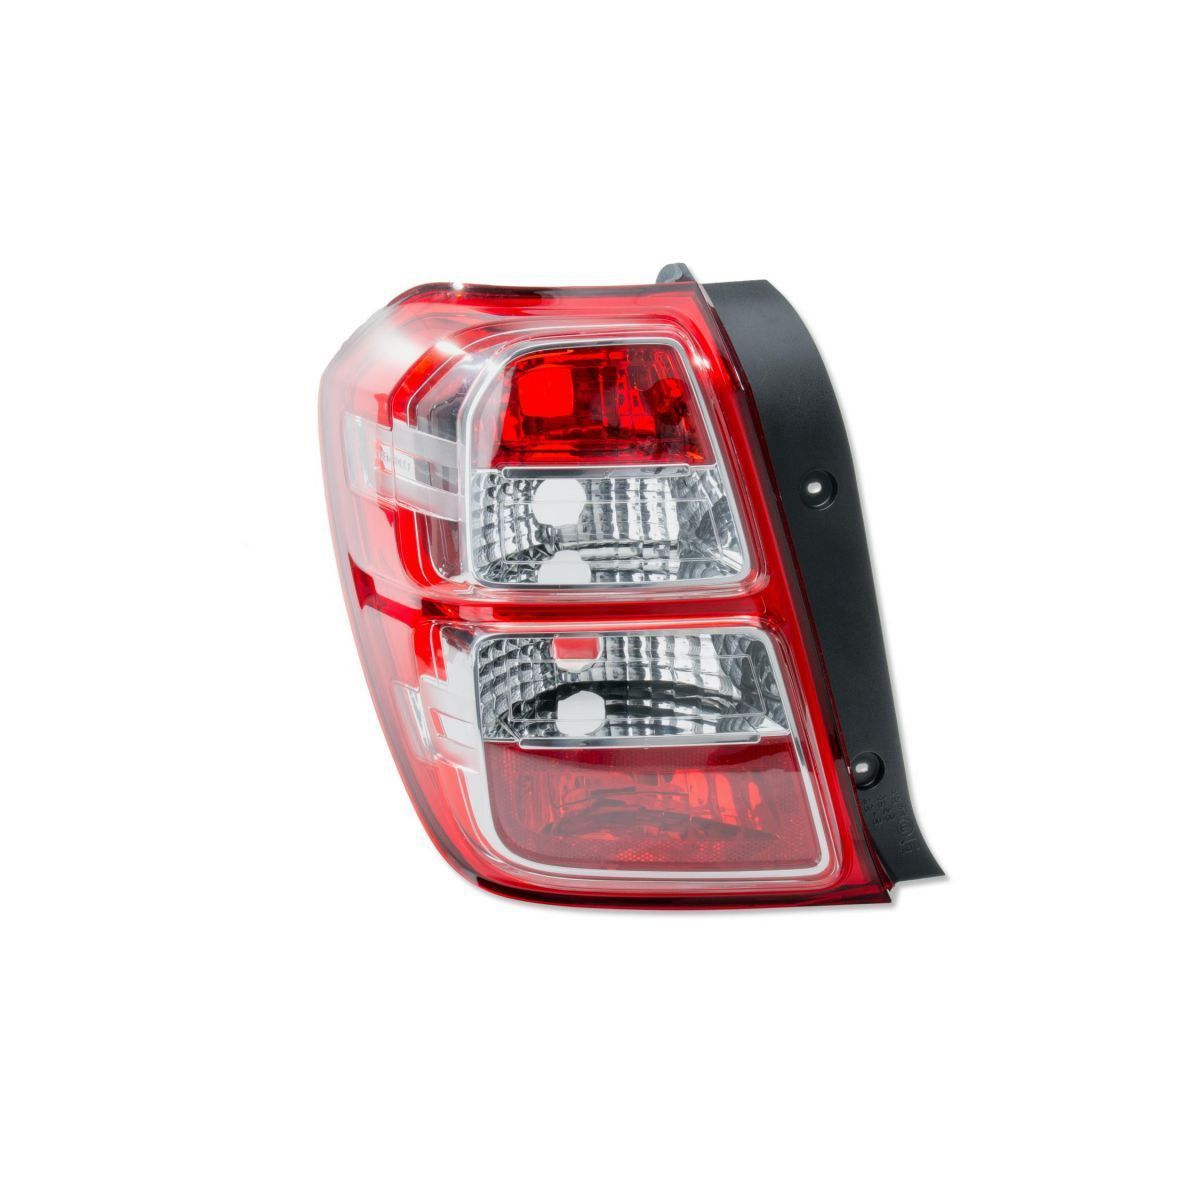 Lanterna traseira s/ lampada lado motorista - Cobalt 2011 Ate 2015